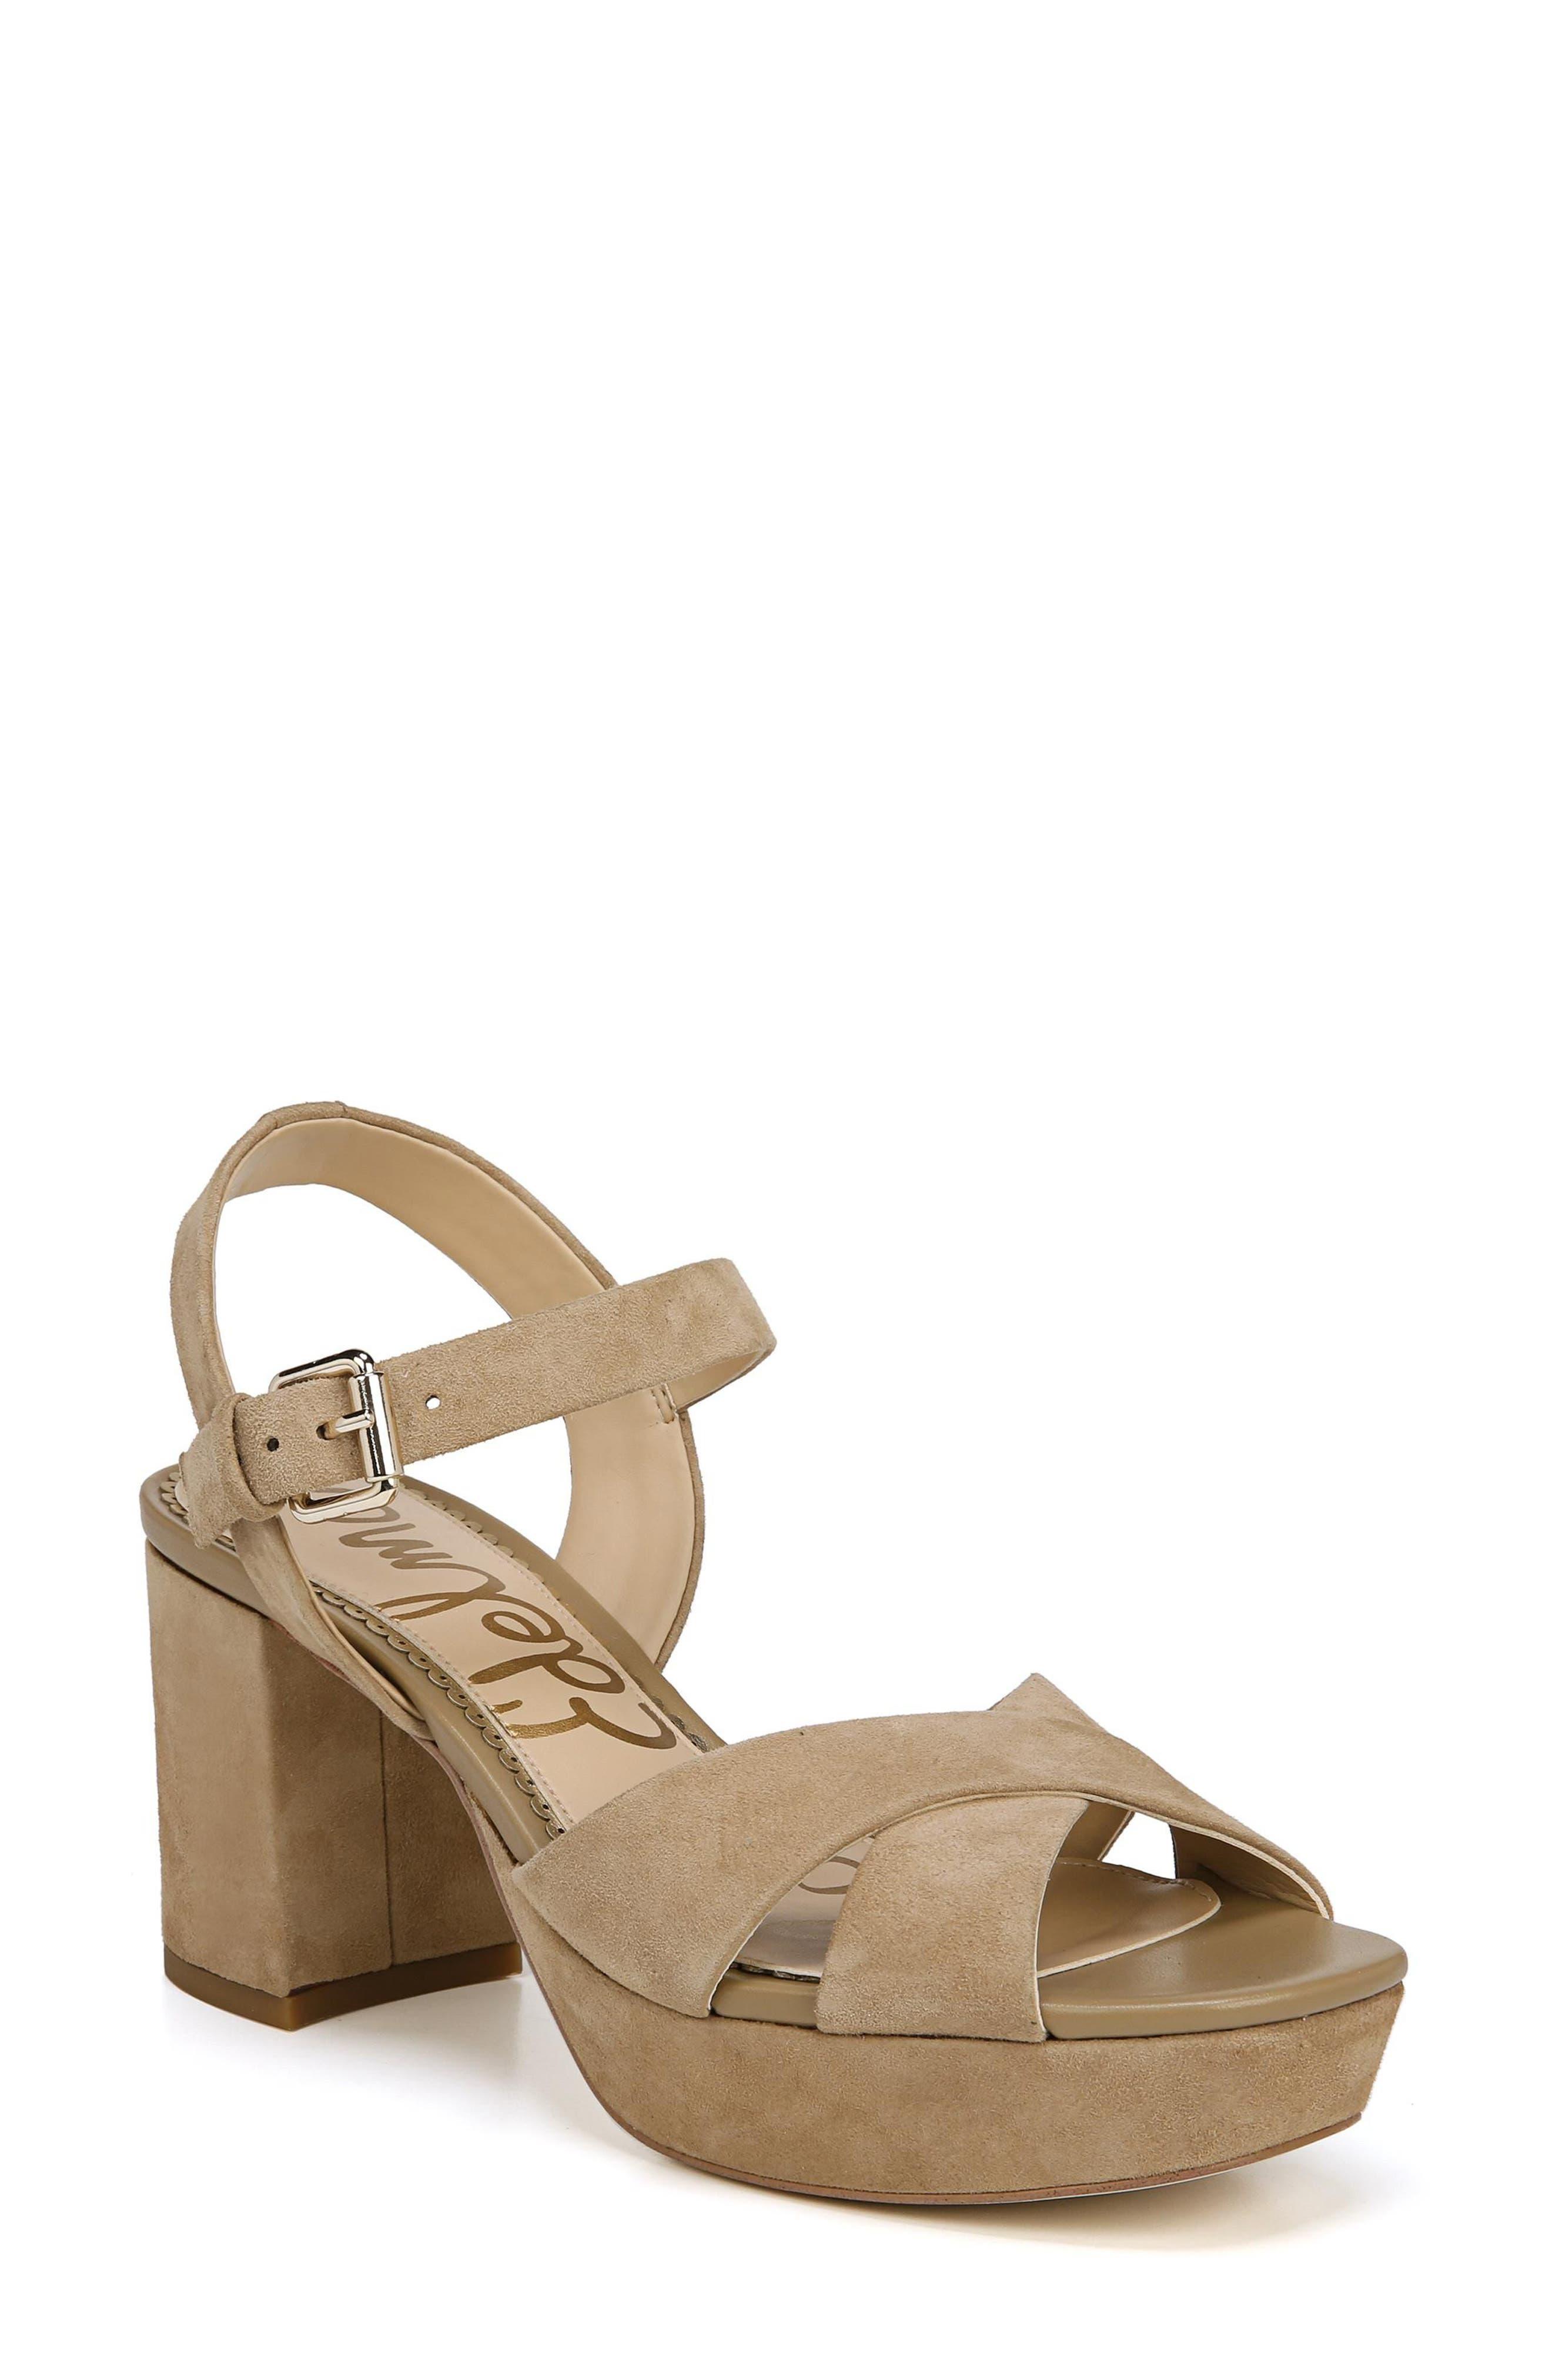 Jolene Platform Sandal,                         Main,                         color, Oatmeal Leather